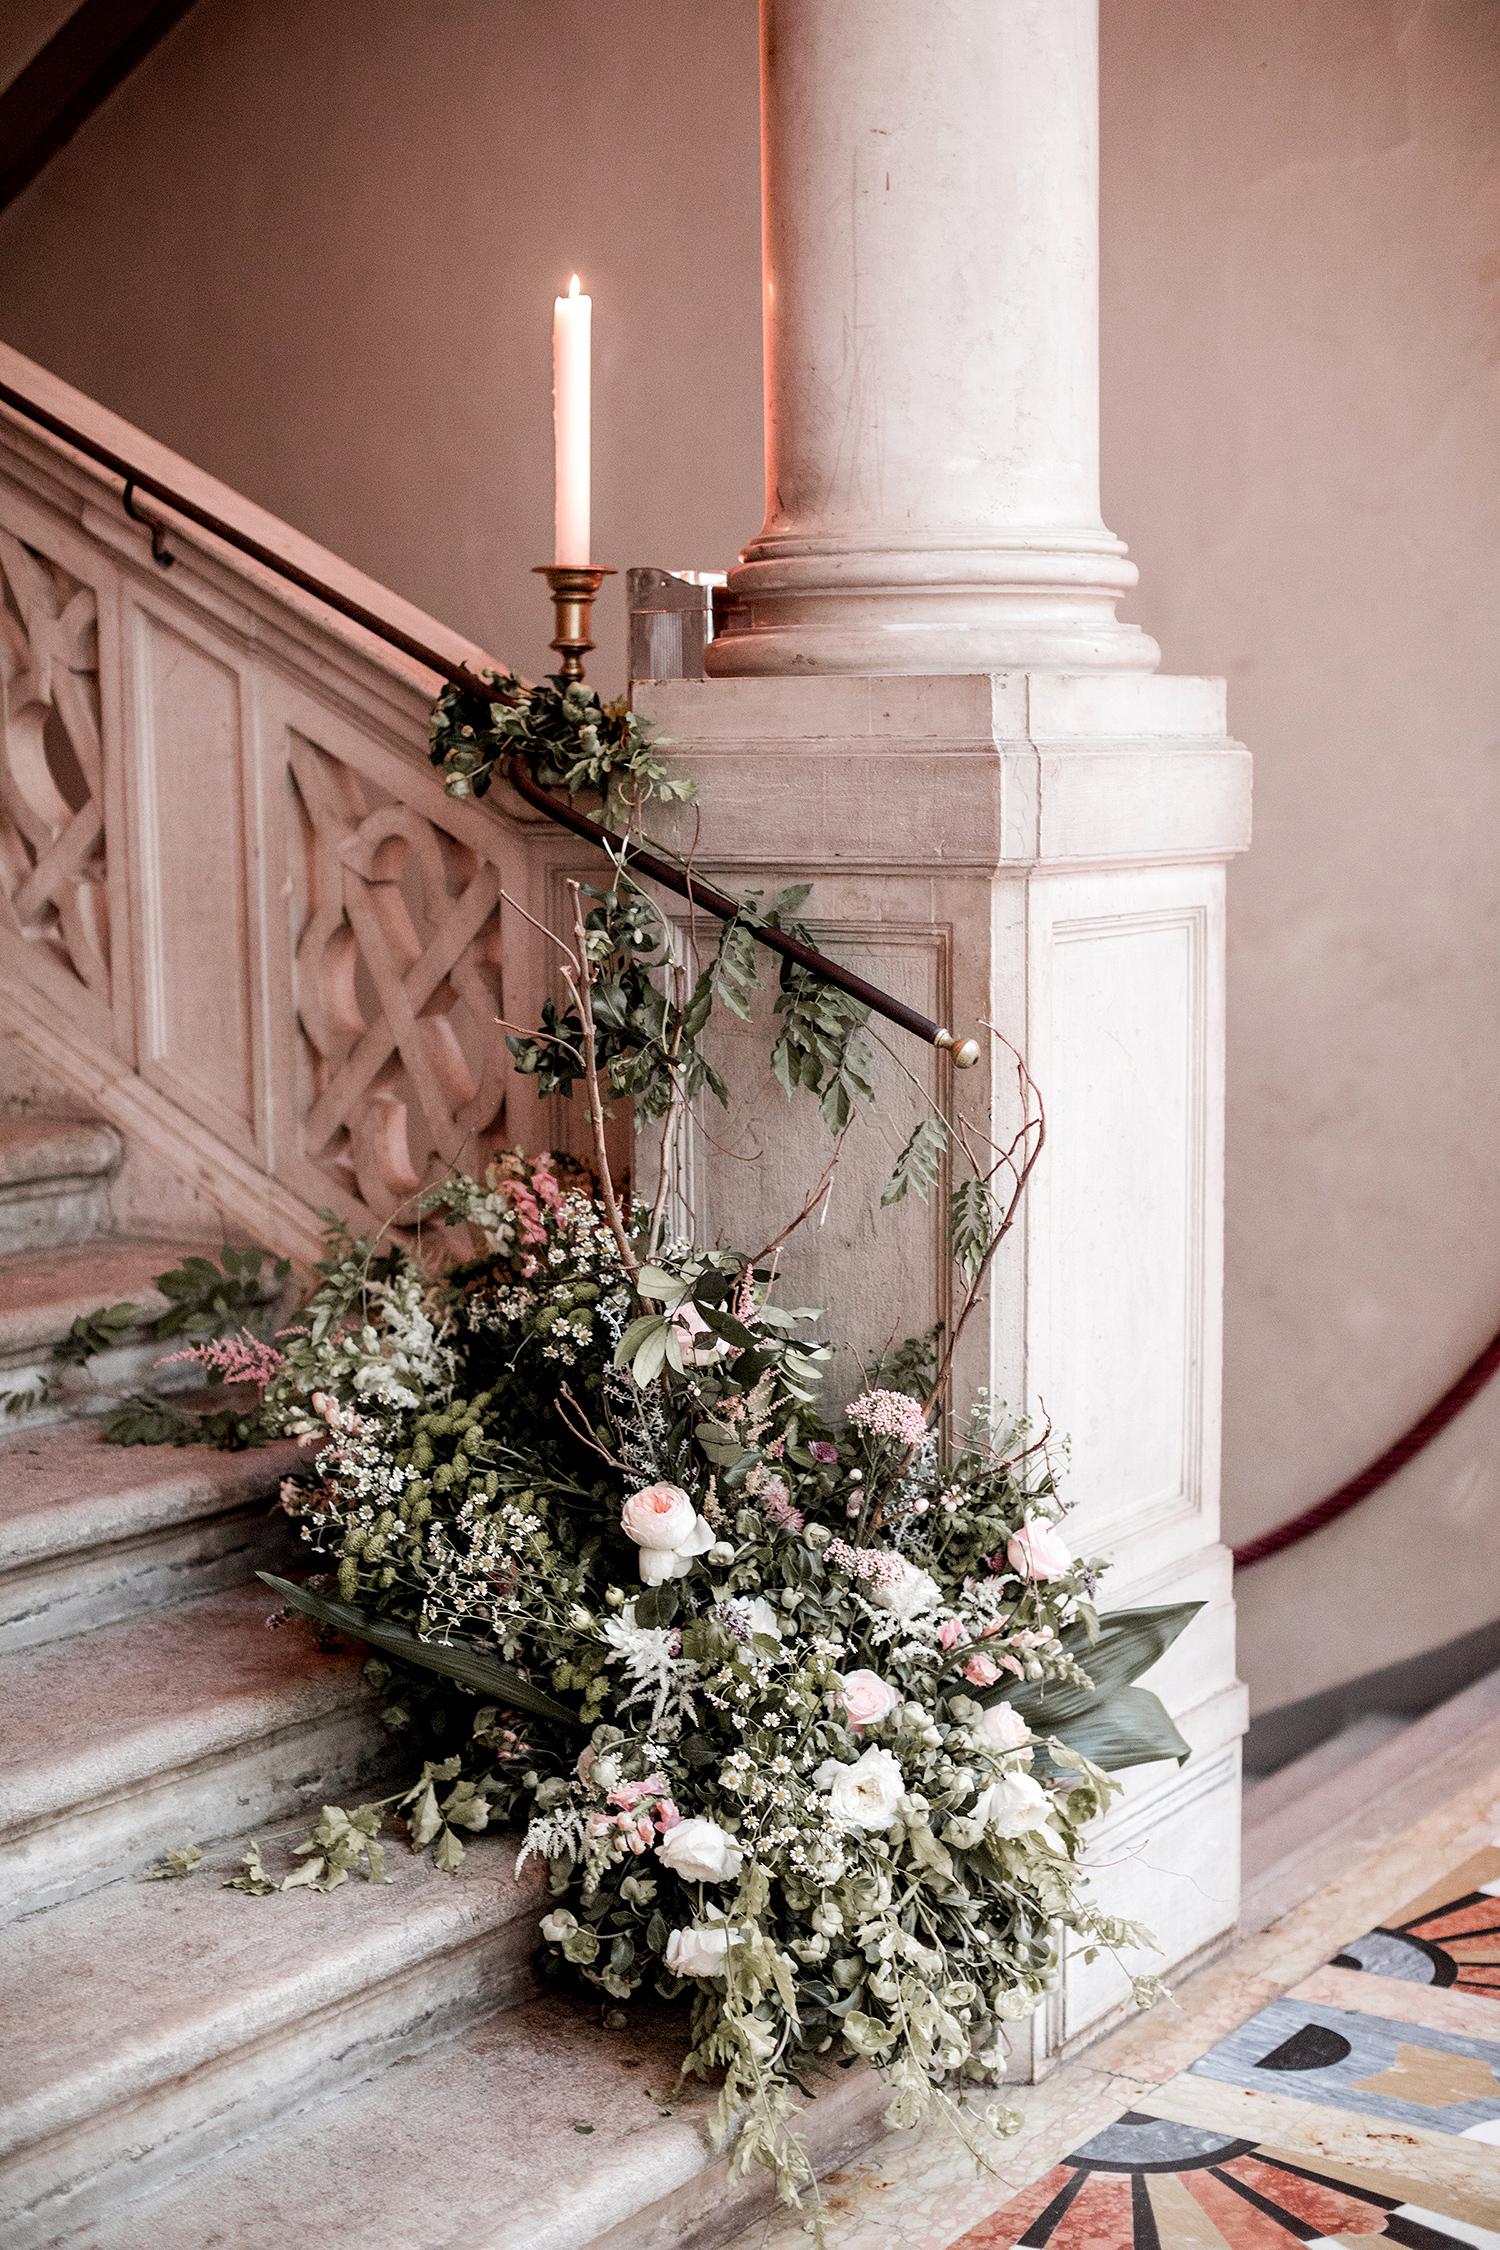 elle raymond venice wedding stairway floral decor